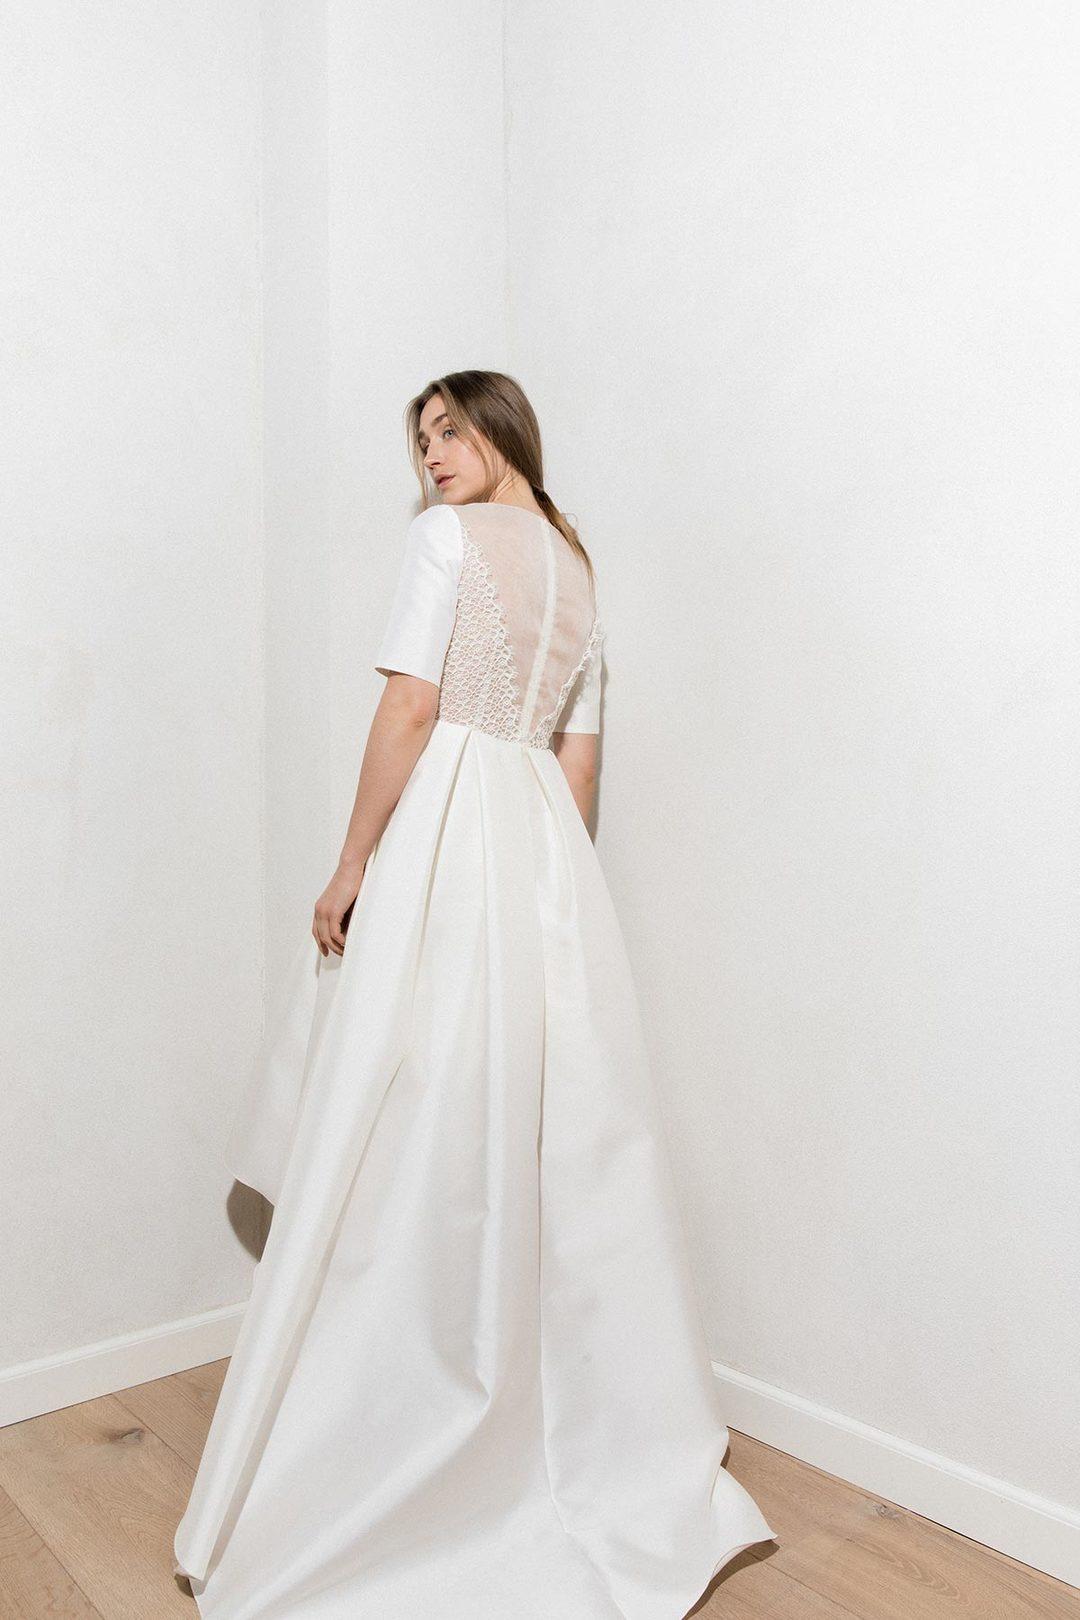 selma dress dress photo